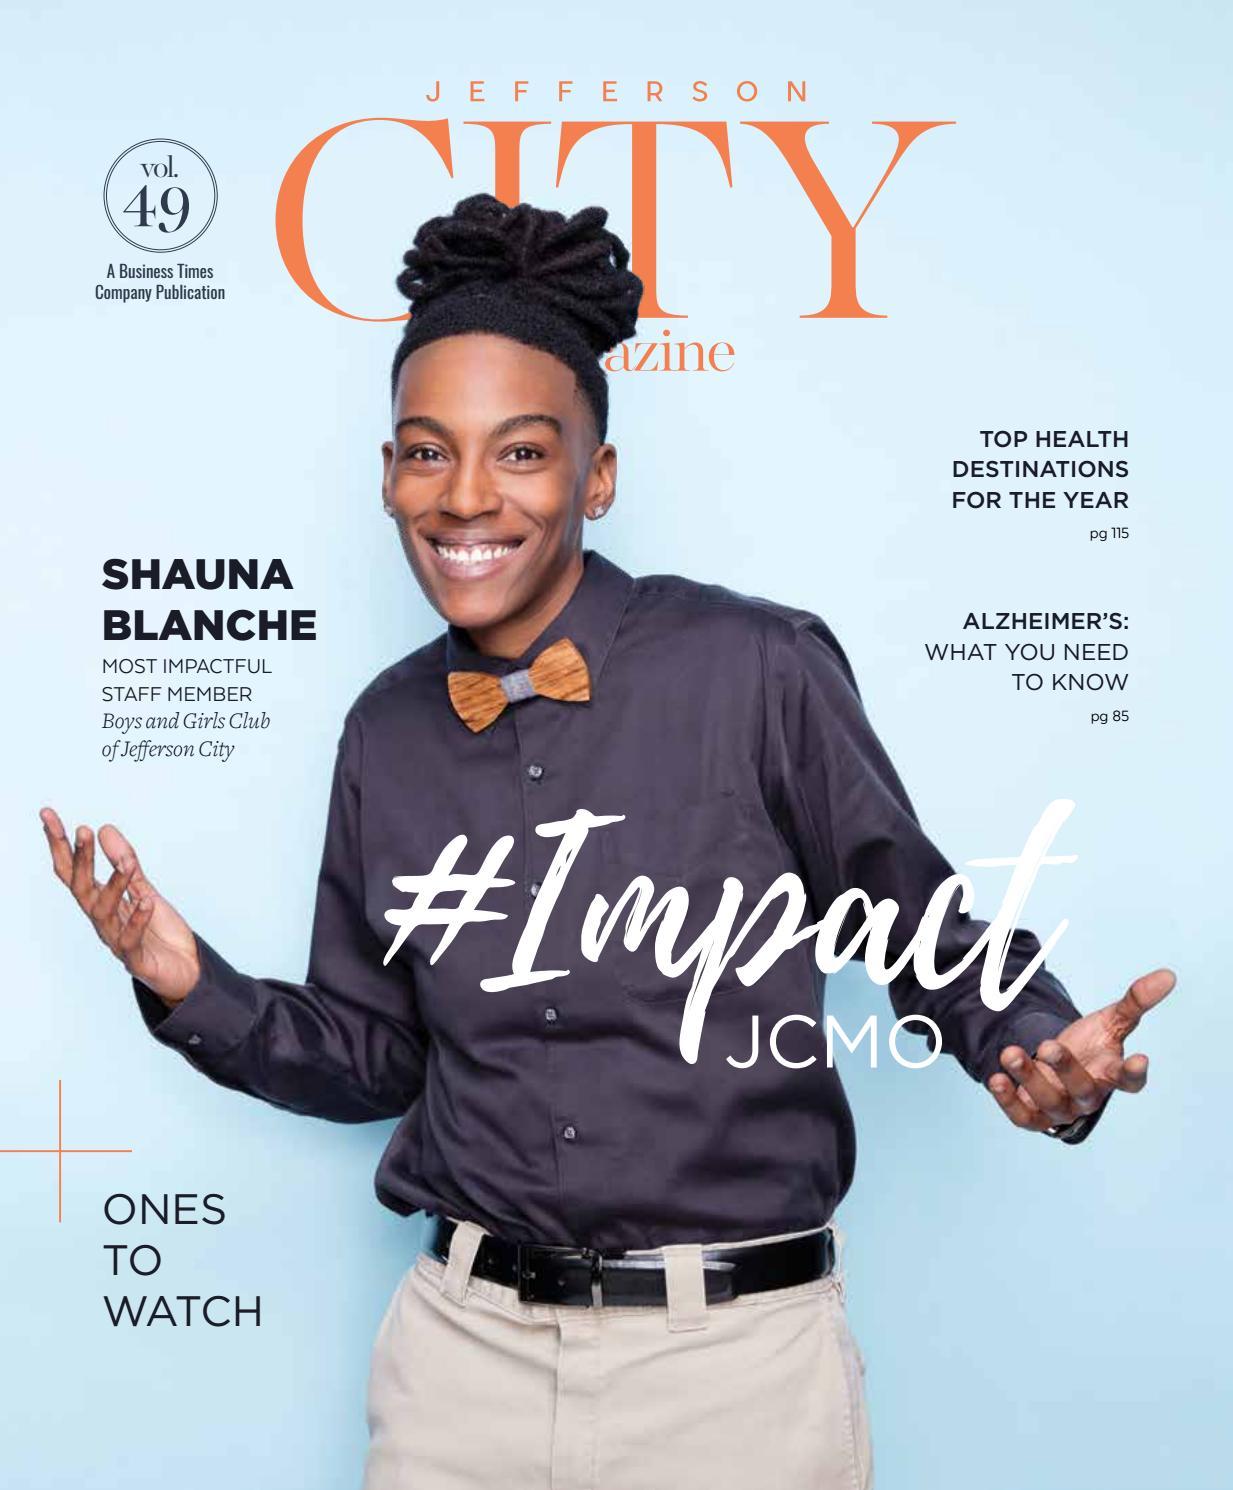 Jefferson City Magazine Jan/Feb 2019 by Business Times